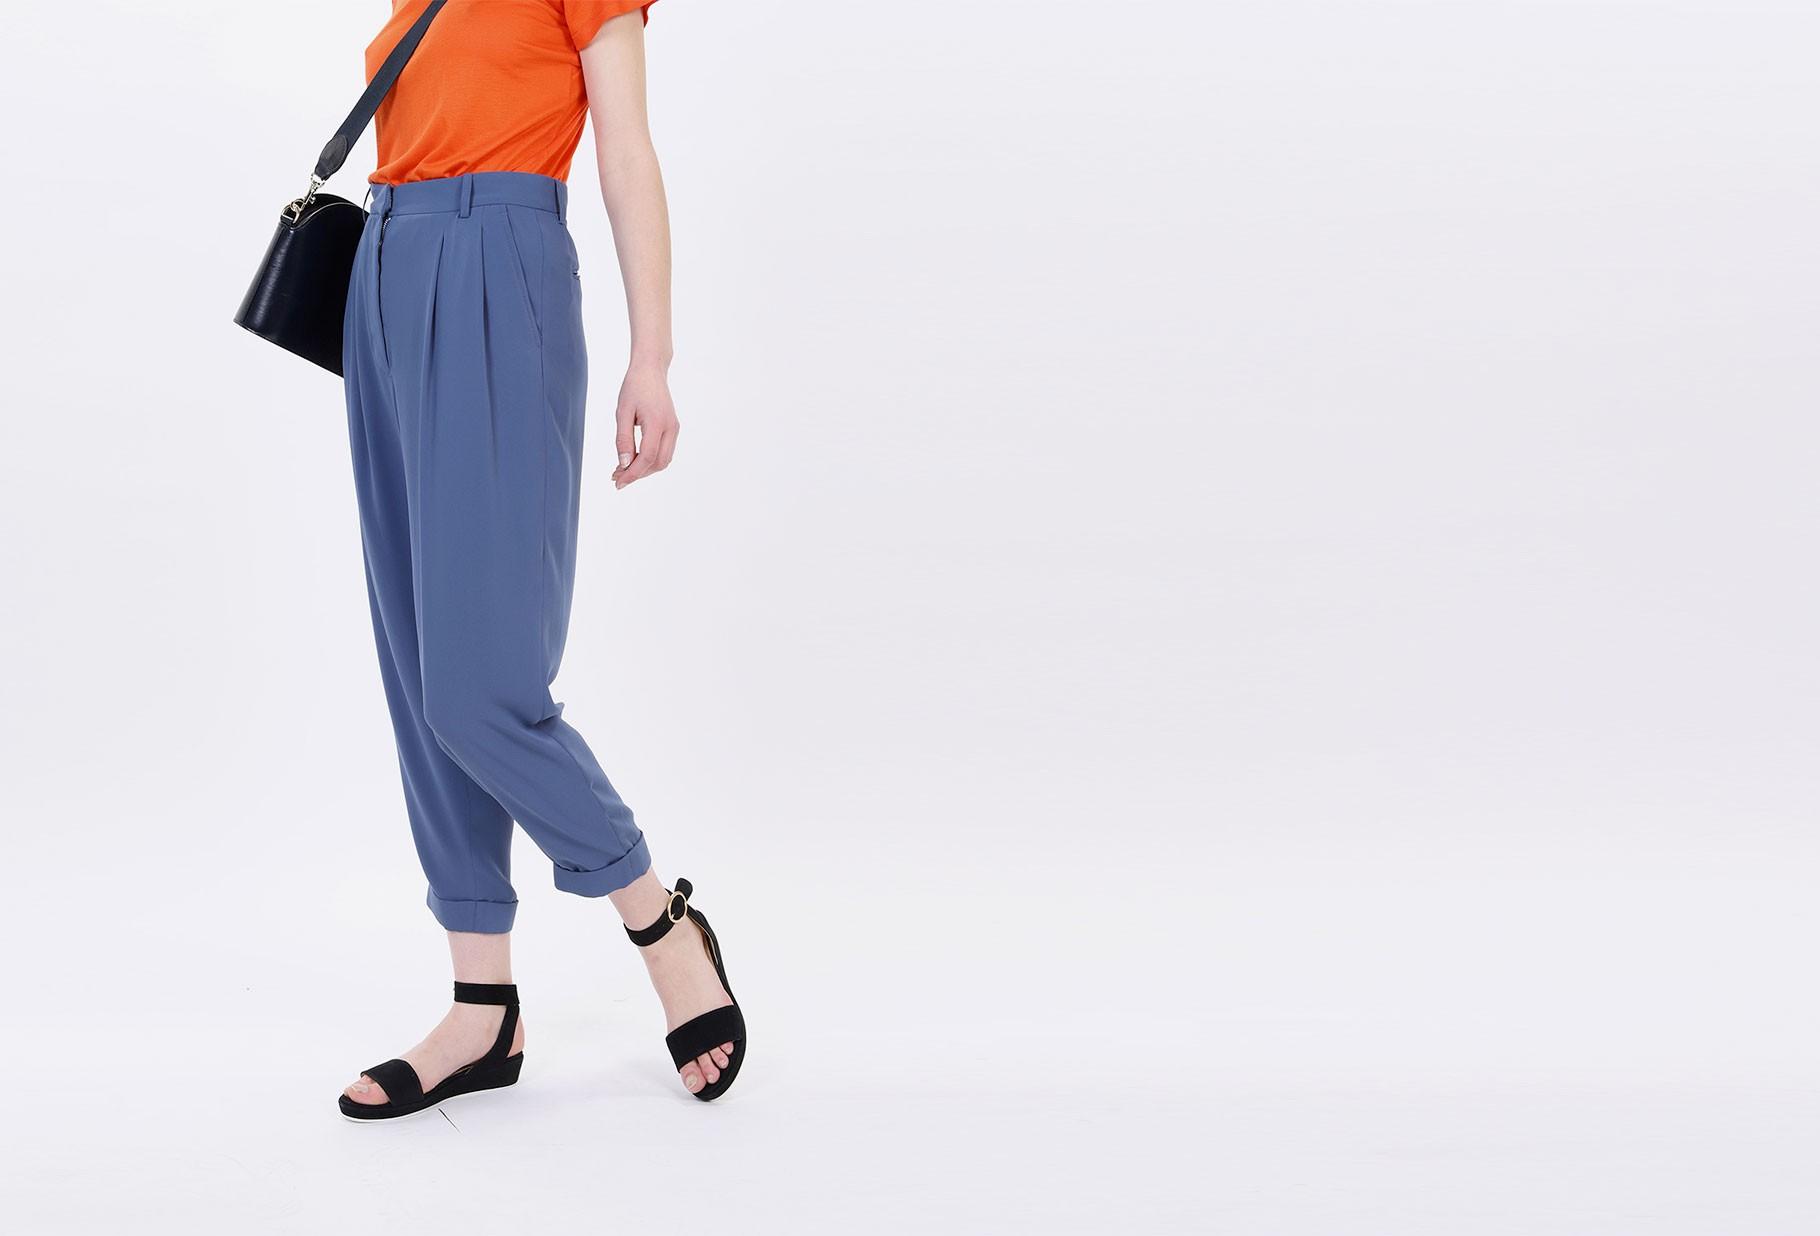 MM6 MAISON MARGIELA FOR WOMAN / Tapered trouser Avio